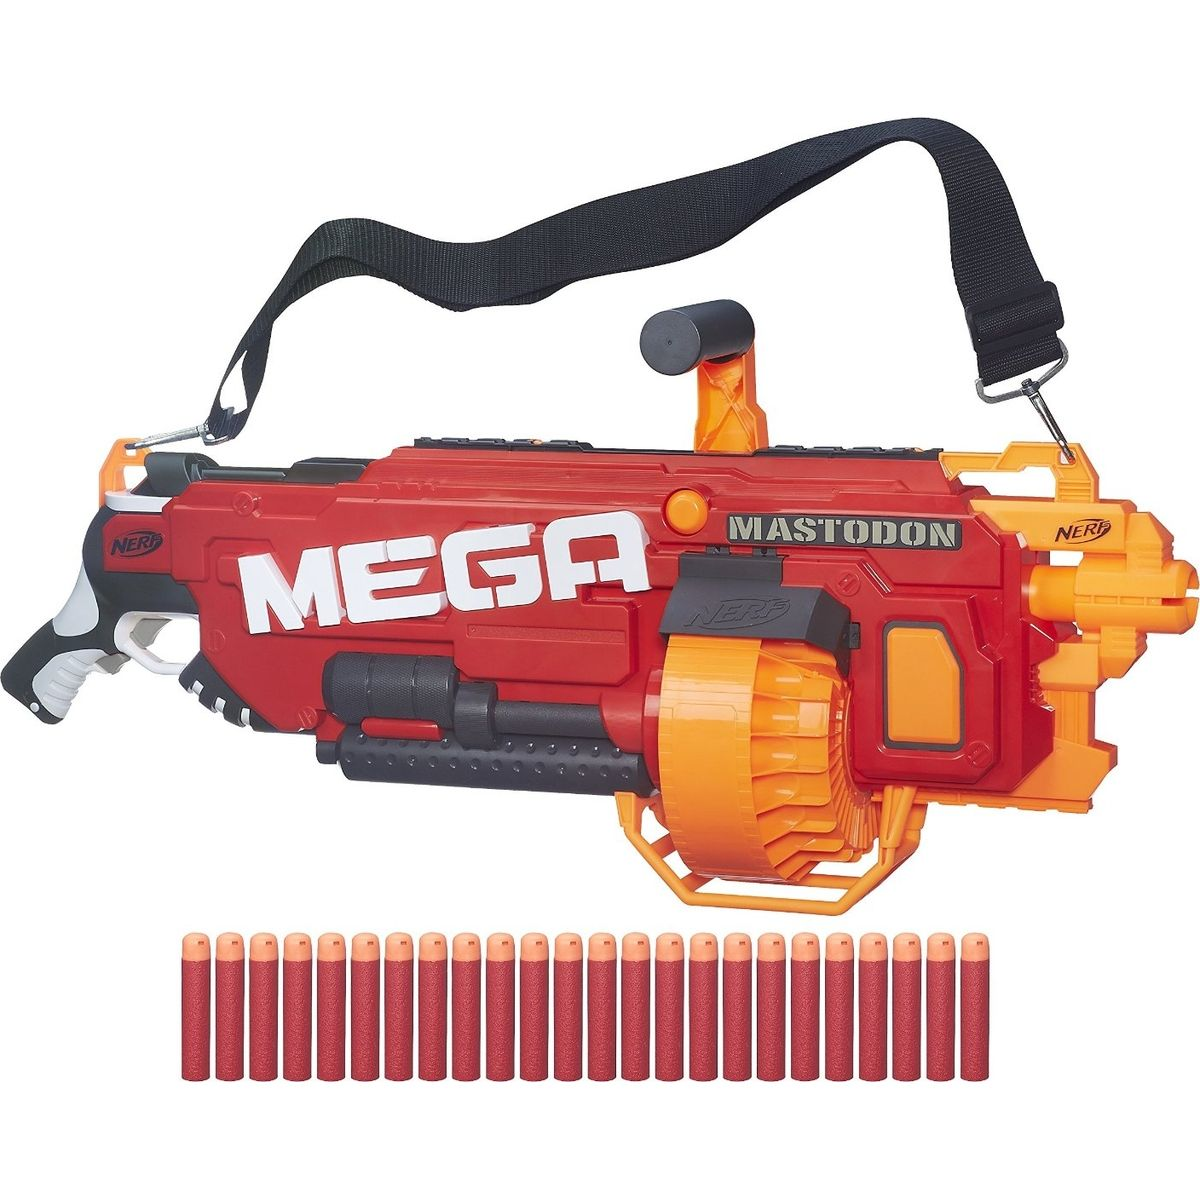 Nerf N-Strike Mega Mastodon - Poškozený obal